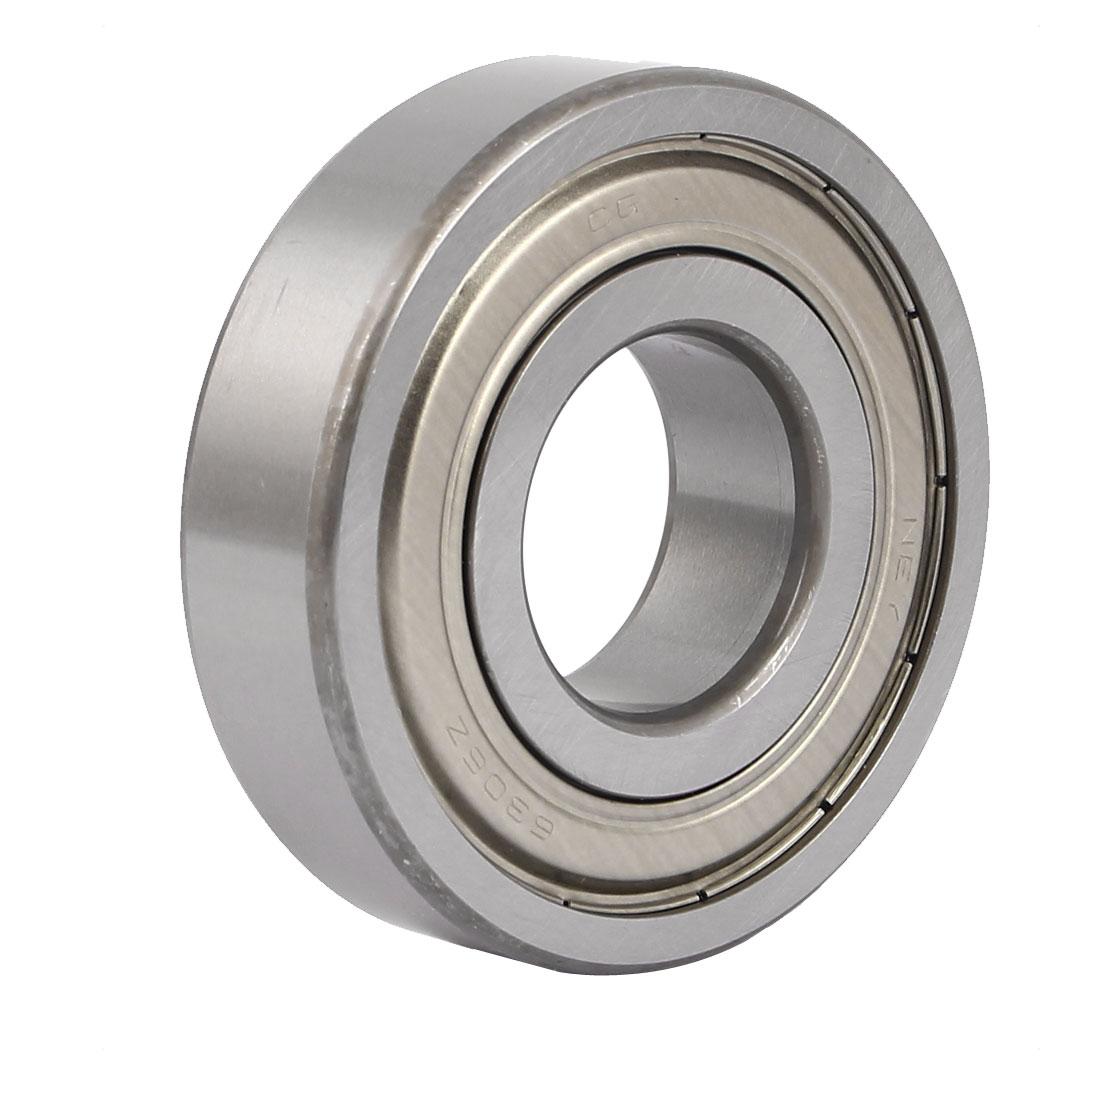 ZZ6305 62mm x 24.5mm Single Row Double Shielded Deep Groove Ball Bearing